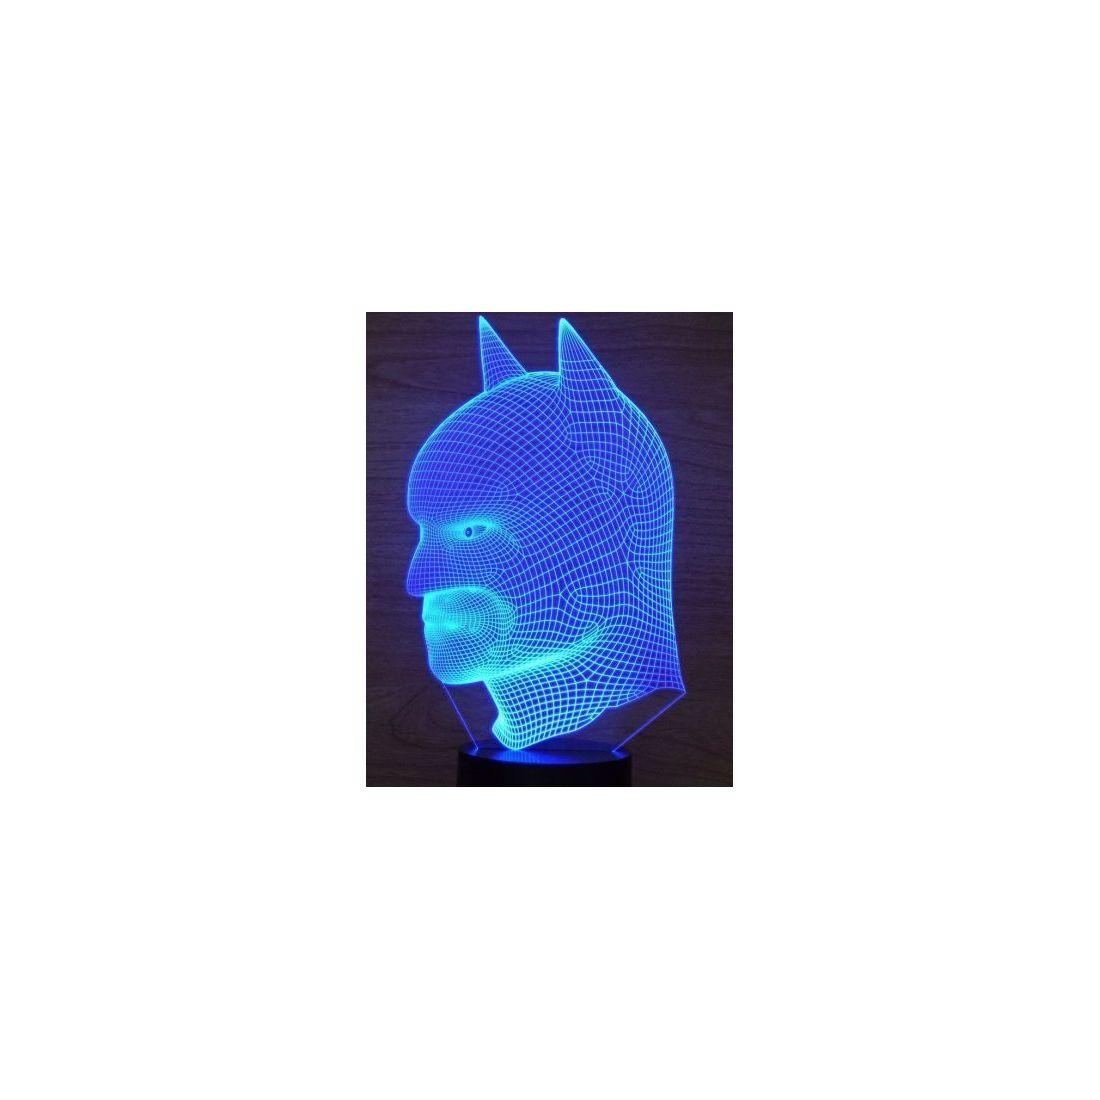 x-dekorace.cz - 3D lampy- Marvel d39bd567bab